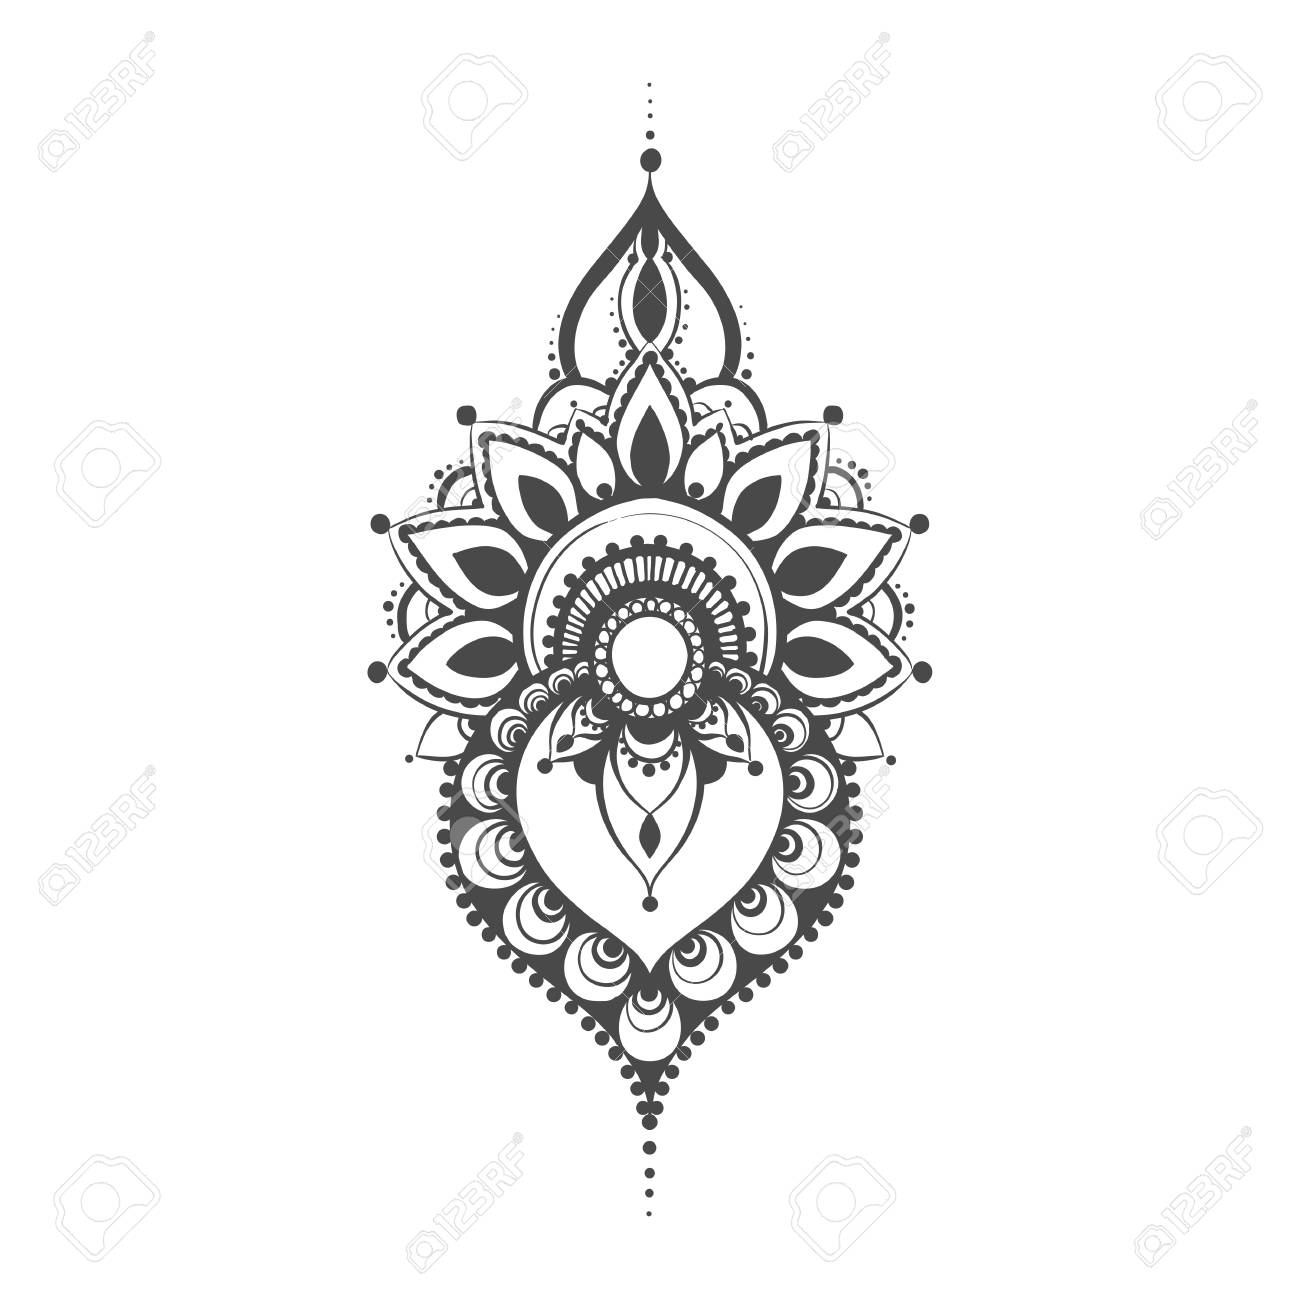 Vector Henna Black Mehndi Illustration On White Background Royalty